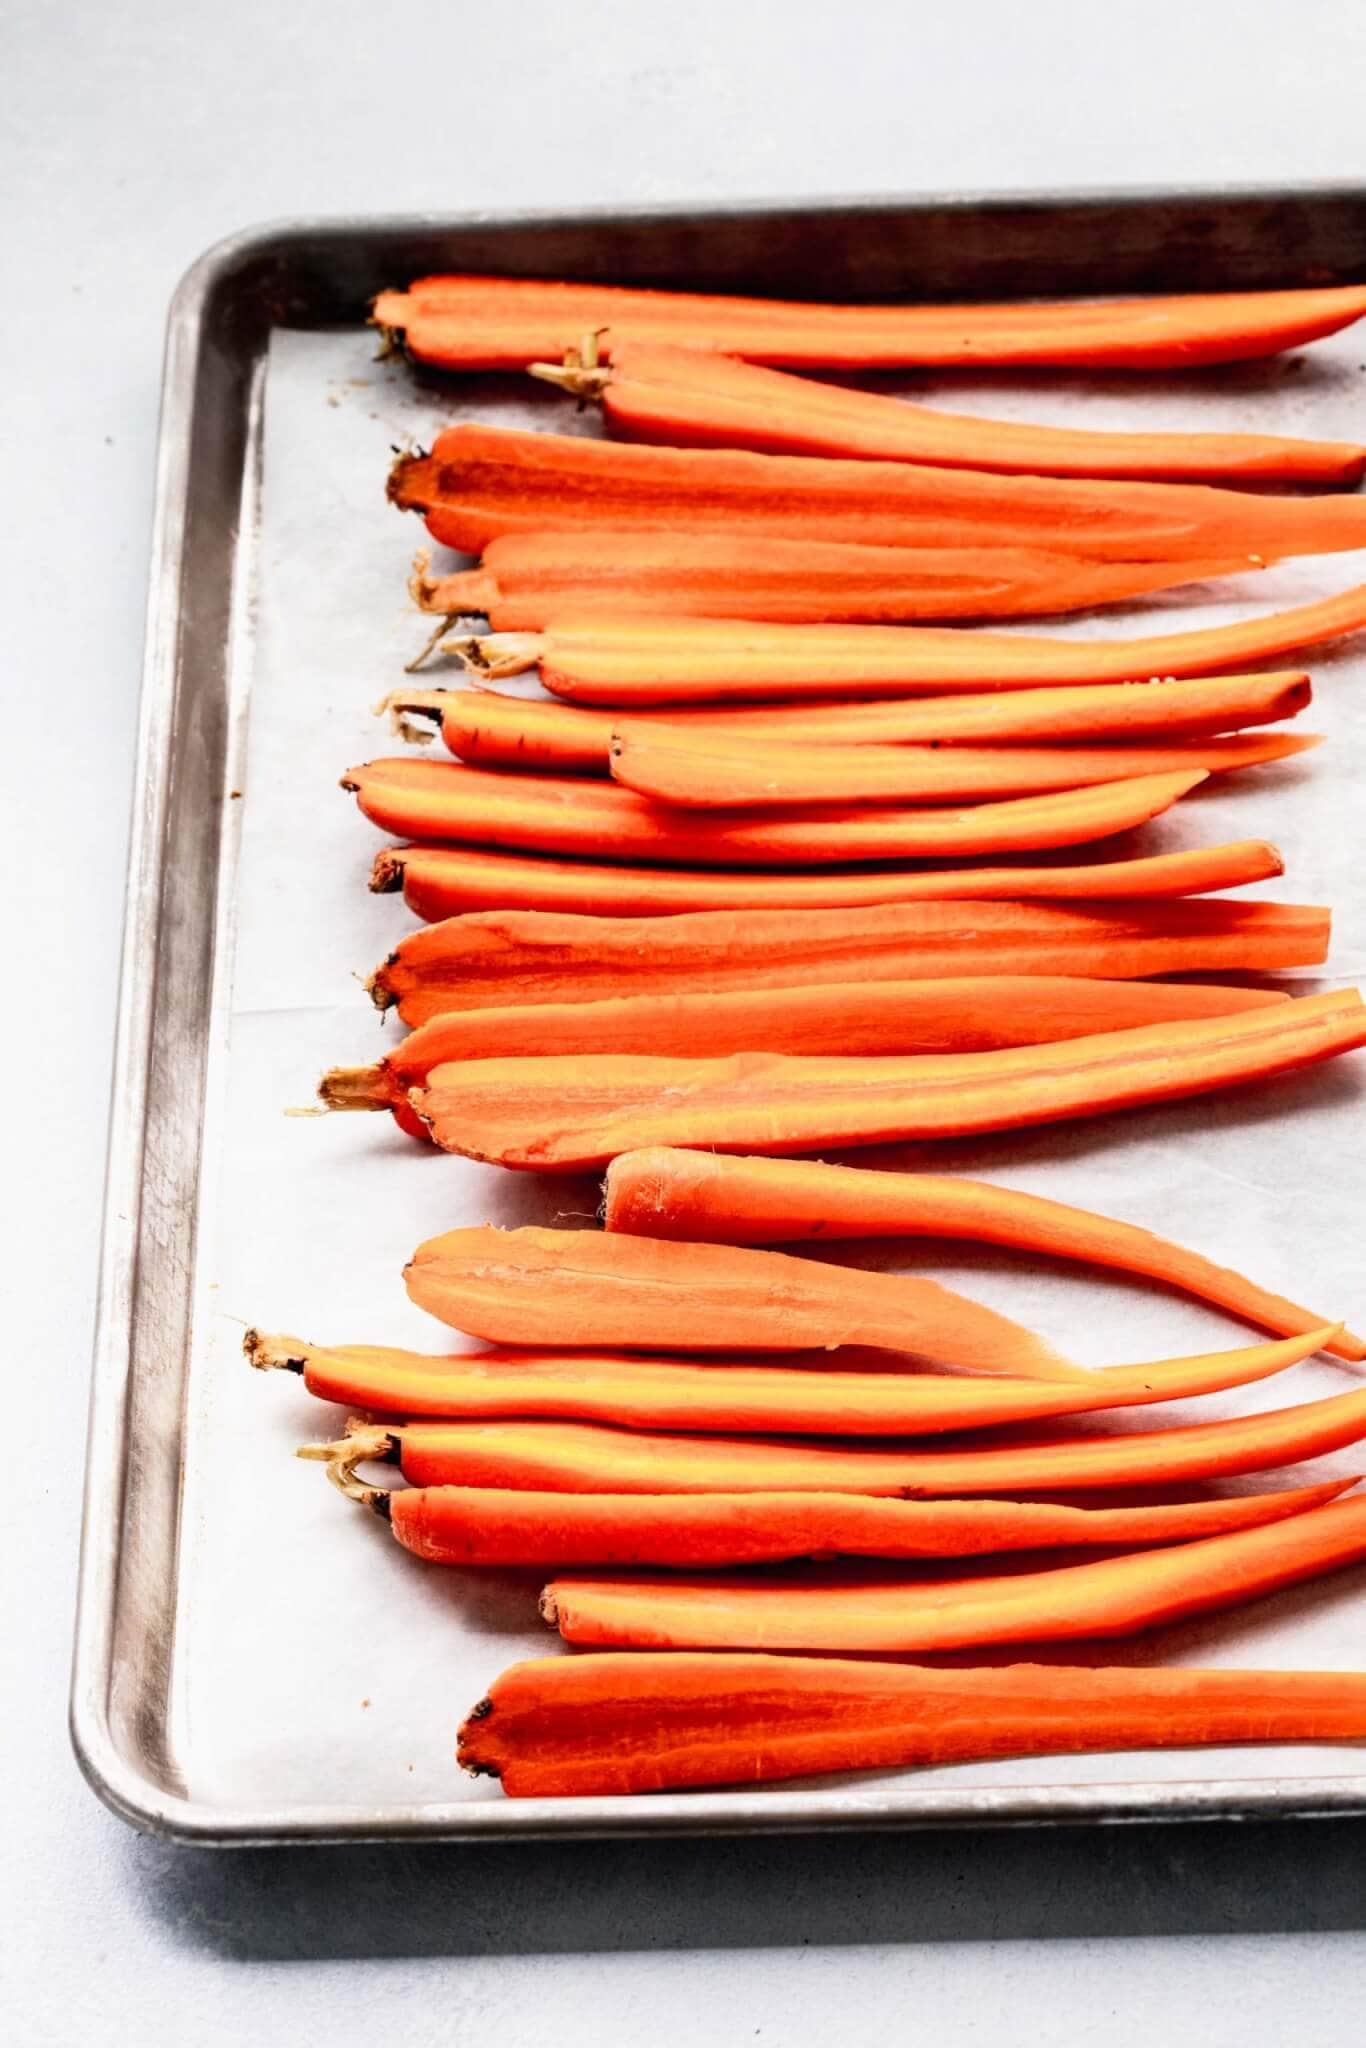 Halved carrots on baking sheet before roasting.